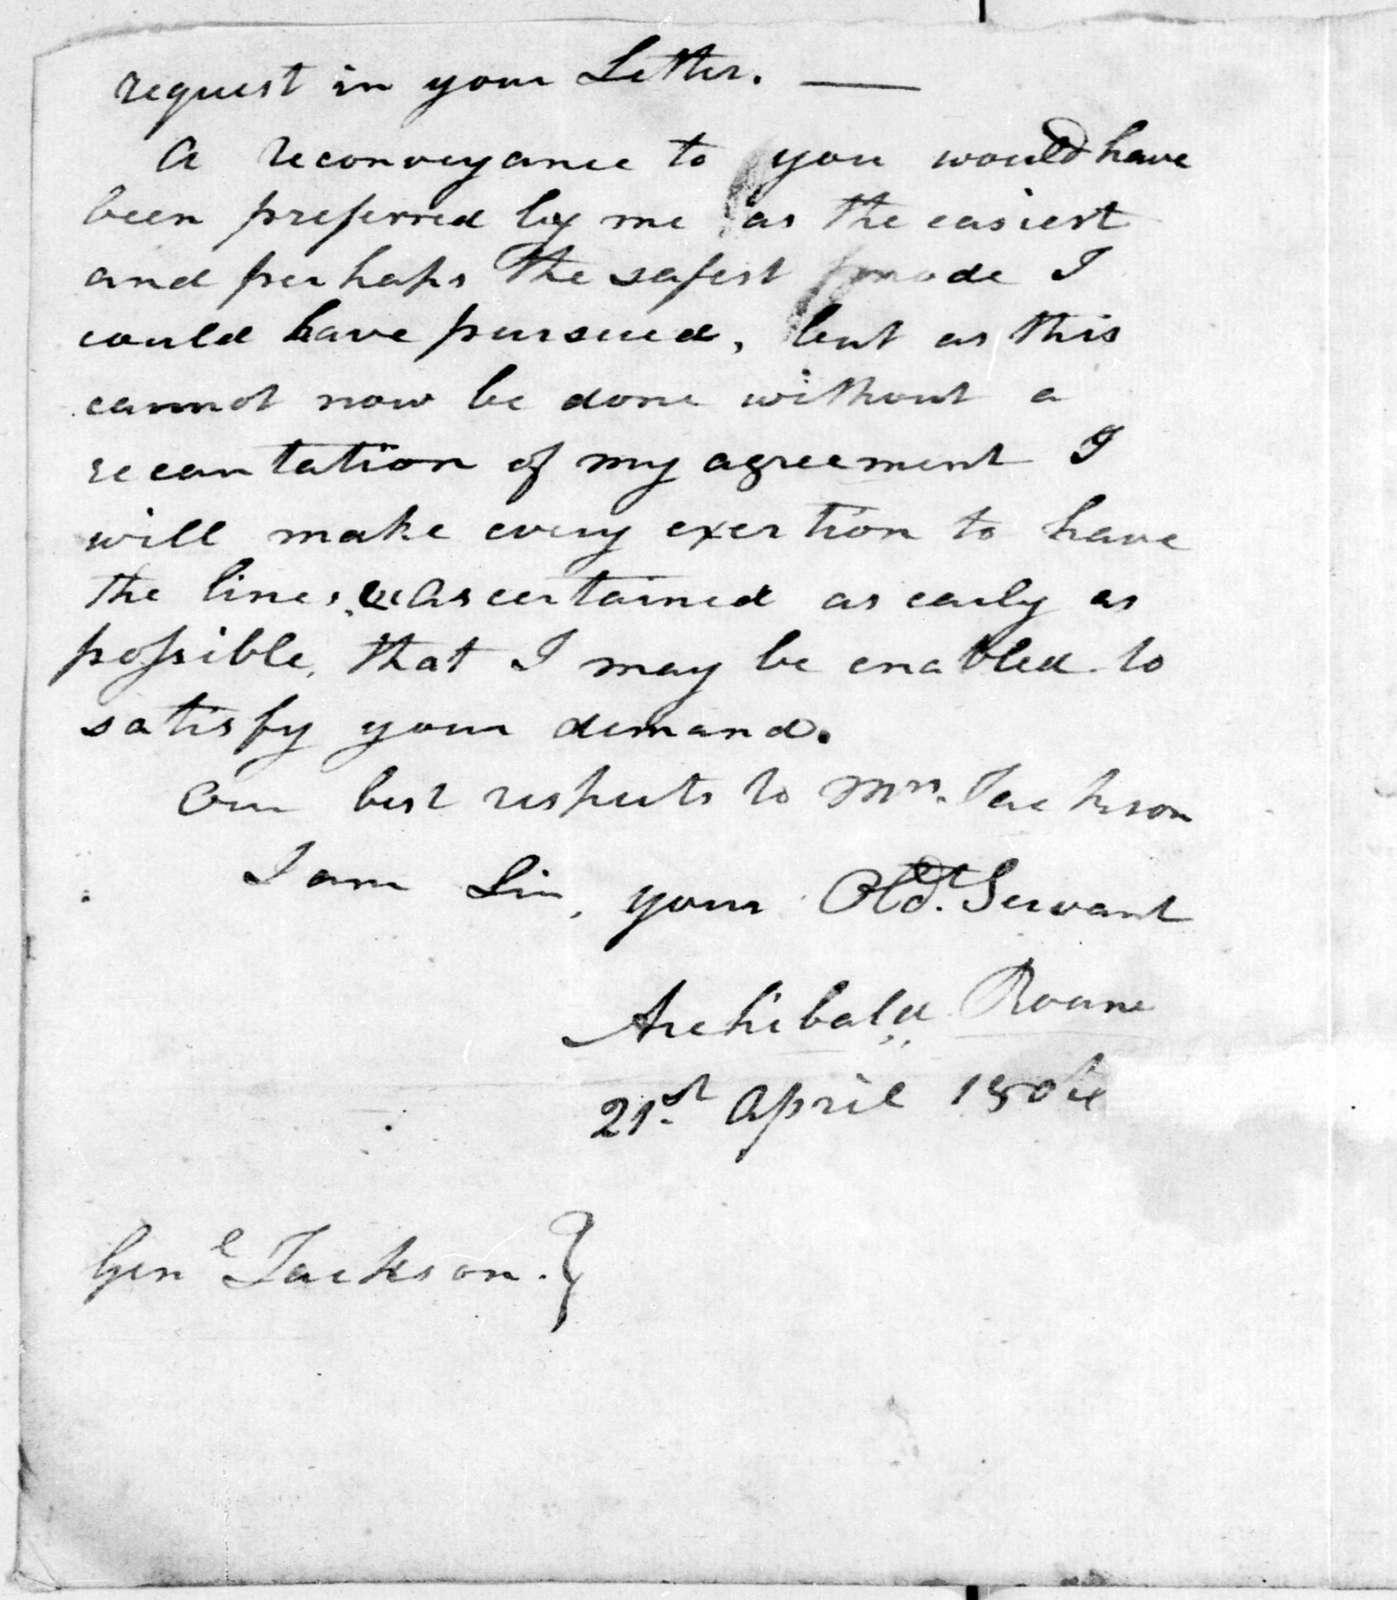 Archibald Roane to Andrew Jackson, April 21, 1806